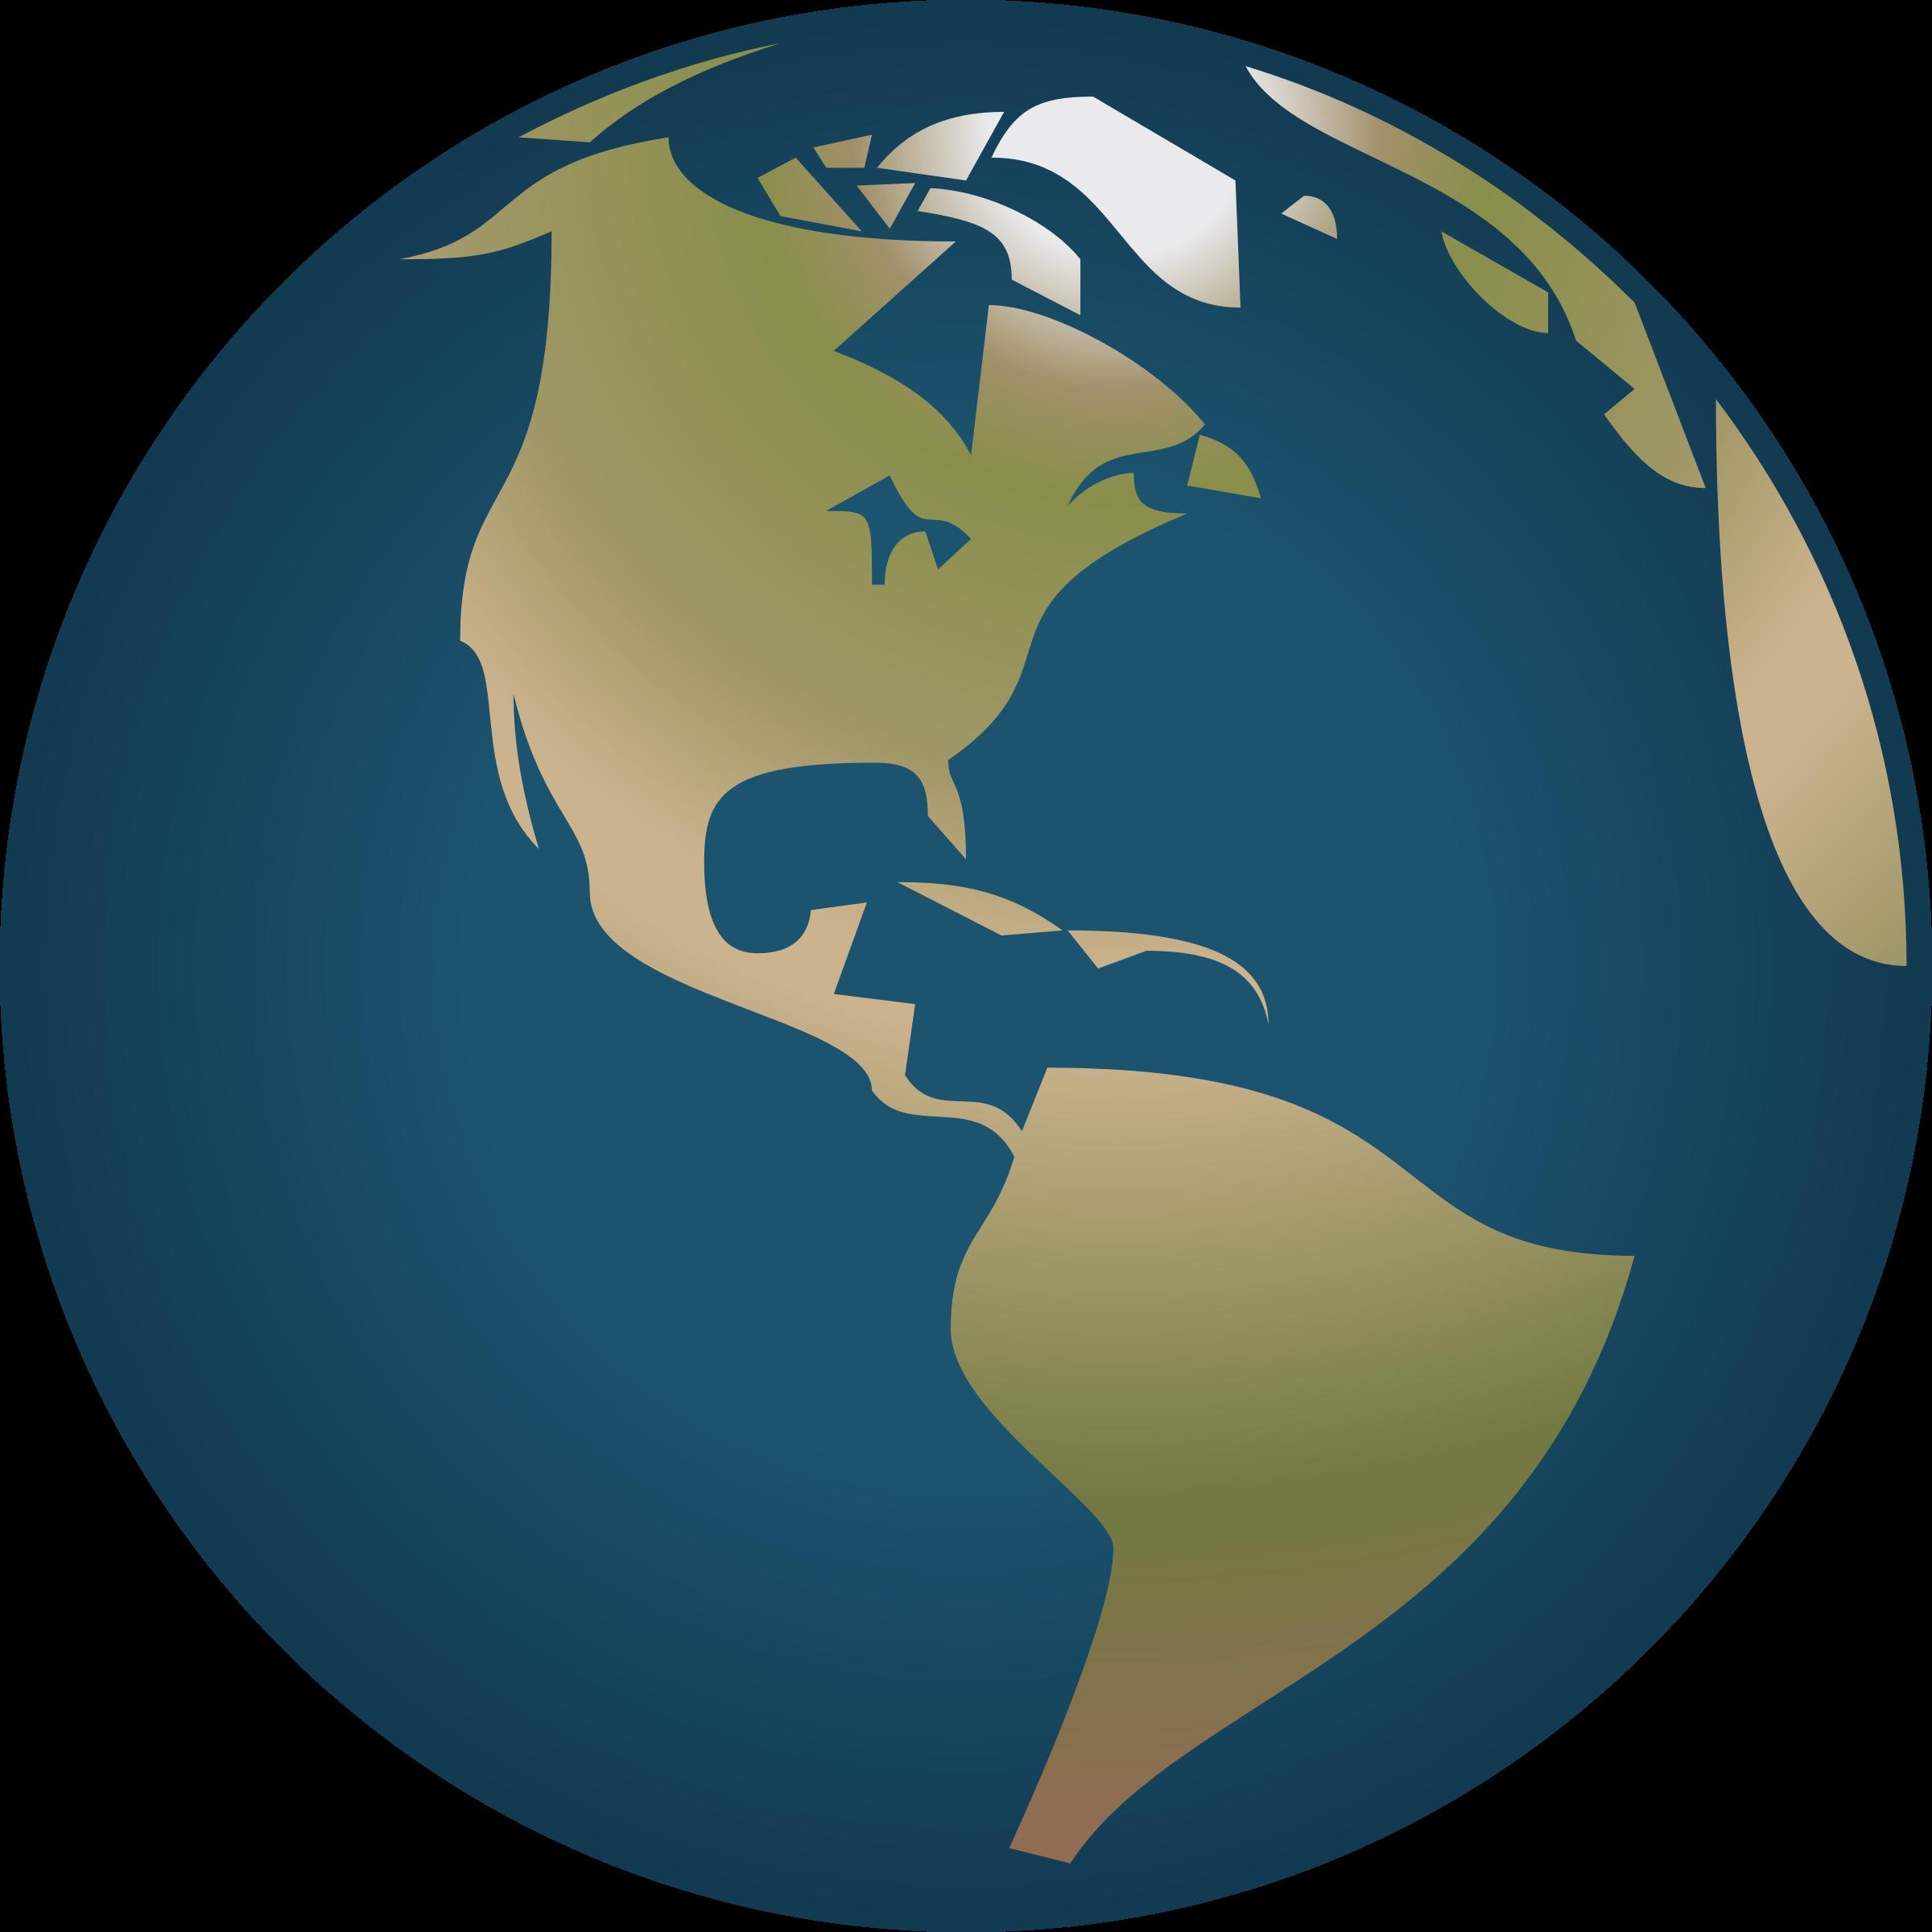 Земной шар PNG